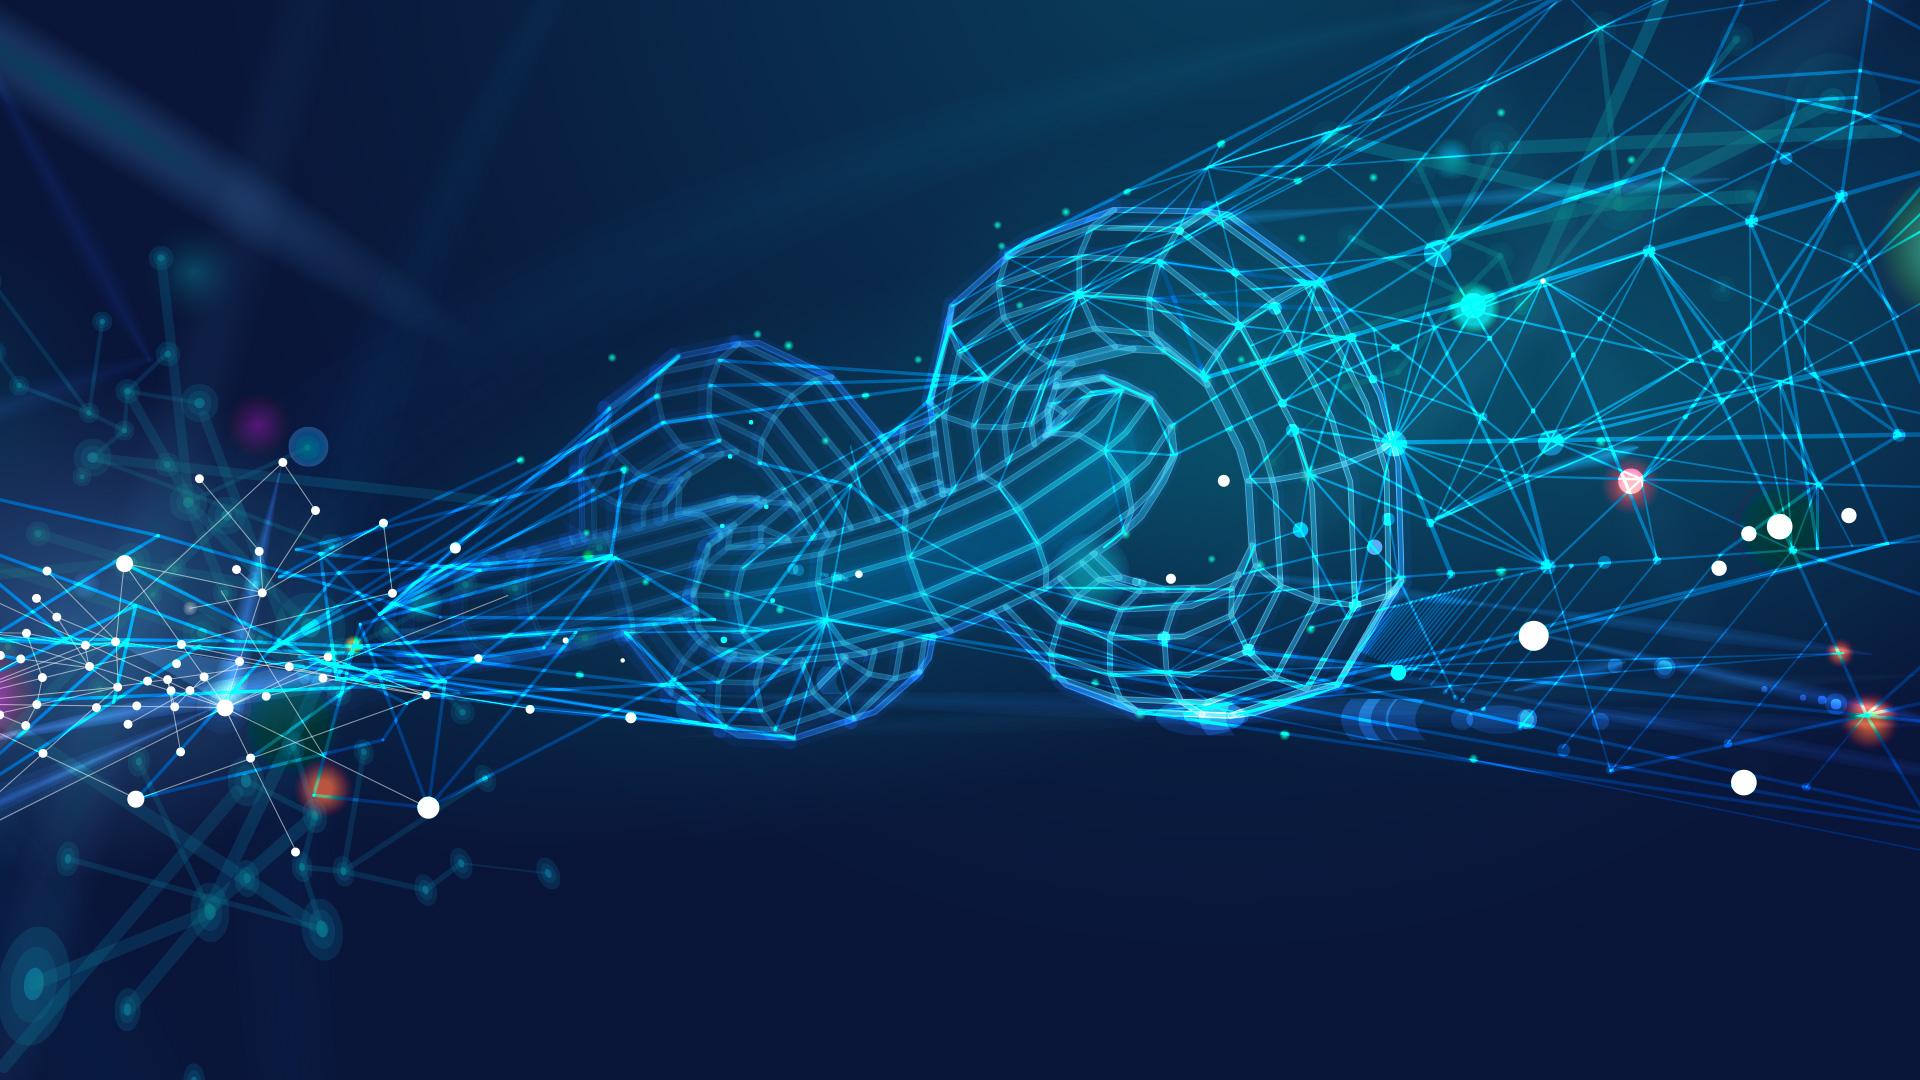 Equigy: A Crowd Balancing Platform based on Blockchain Technology